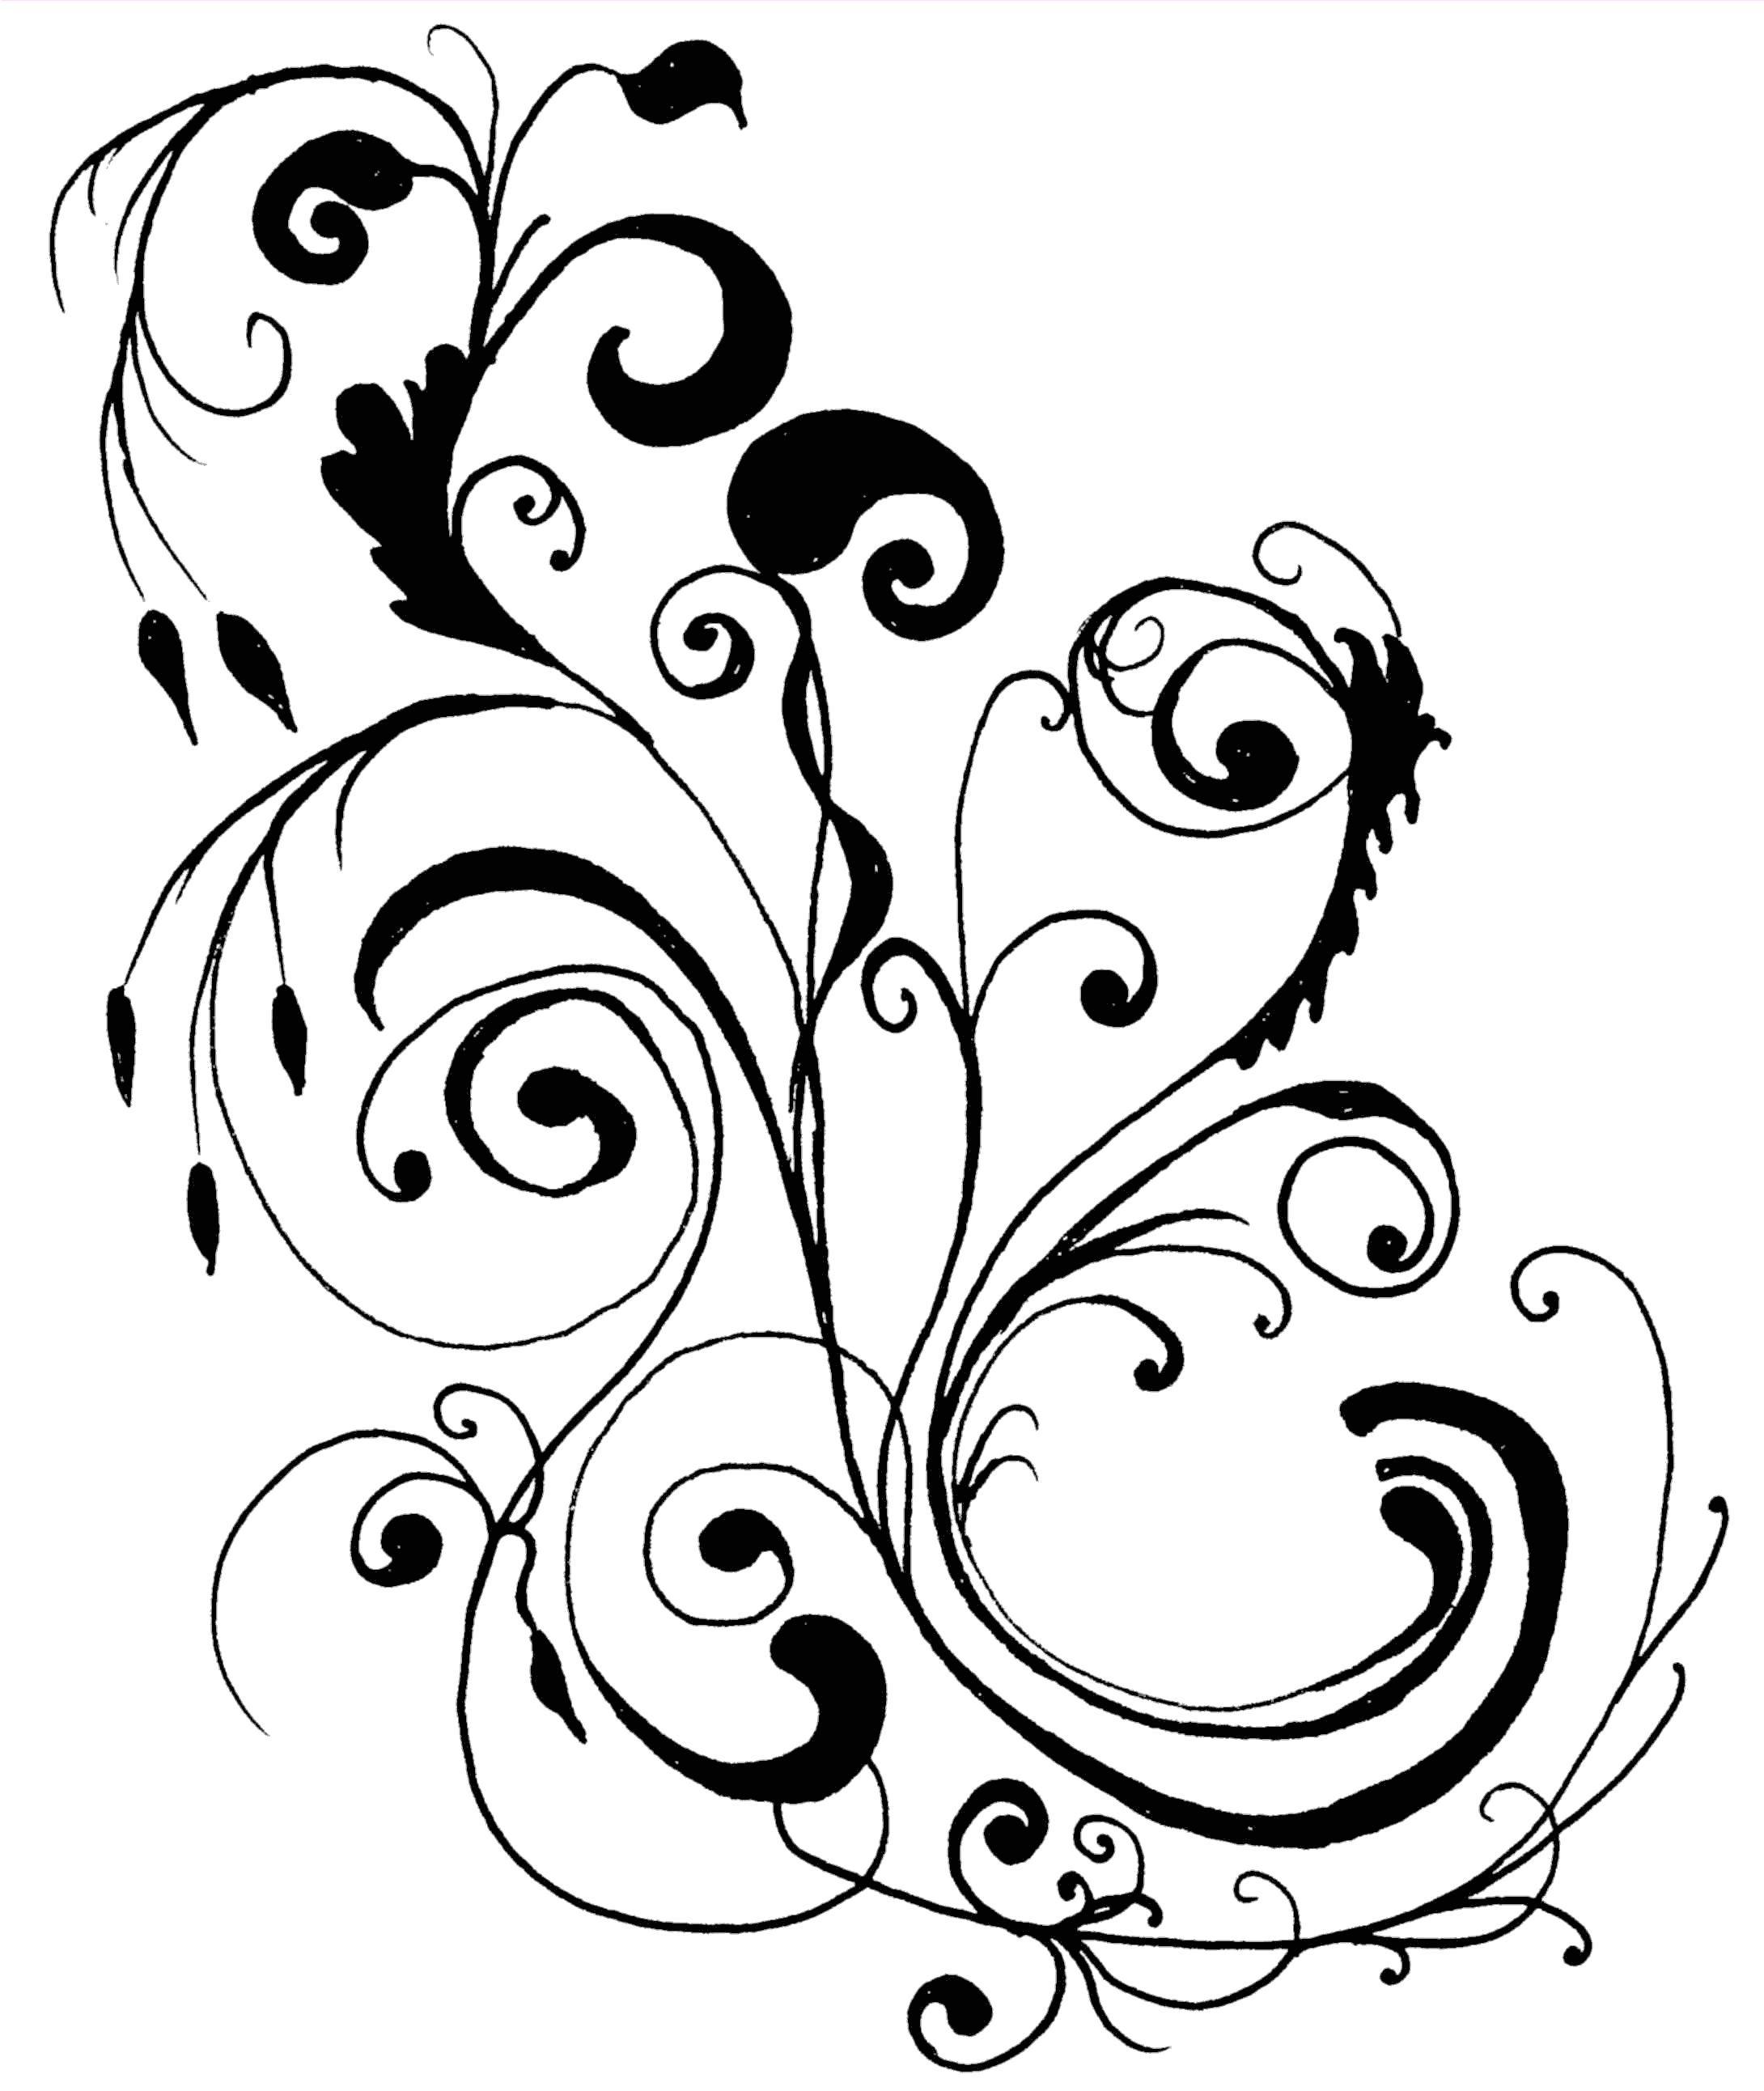 Freeform Line Art